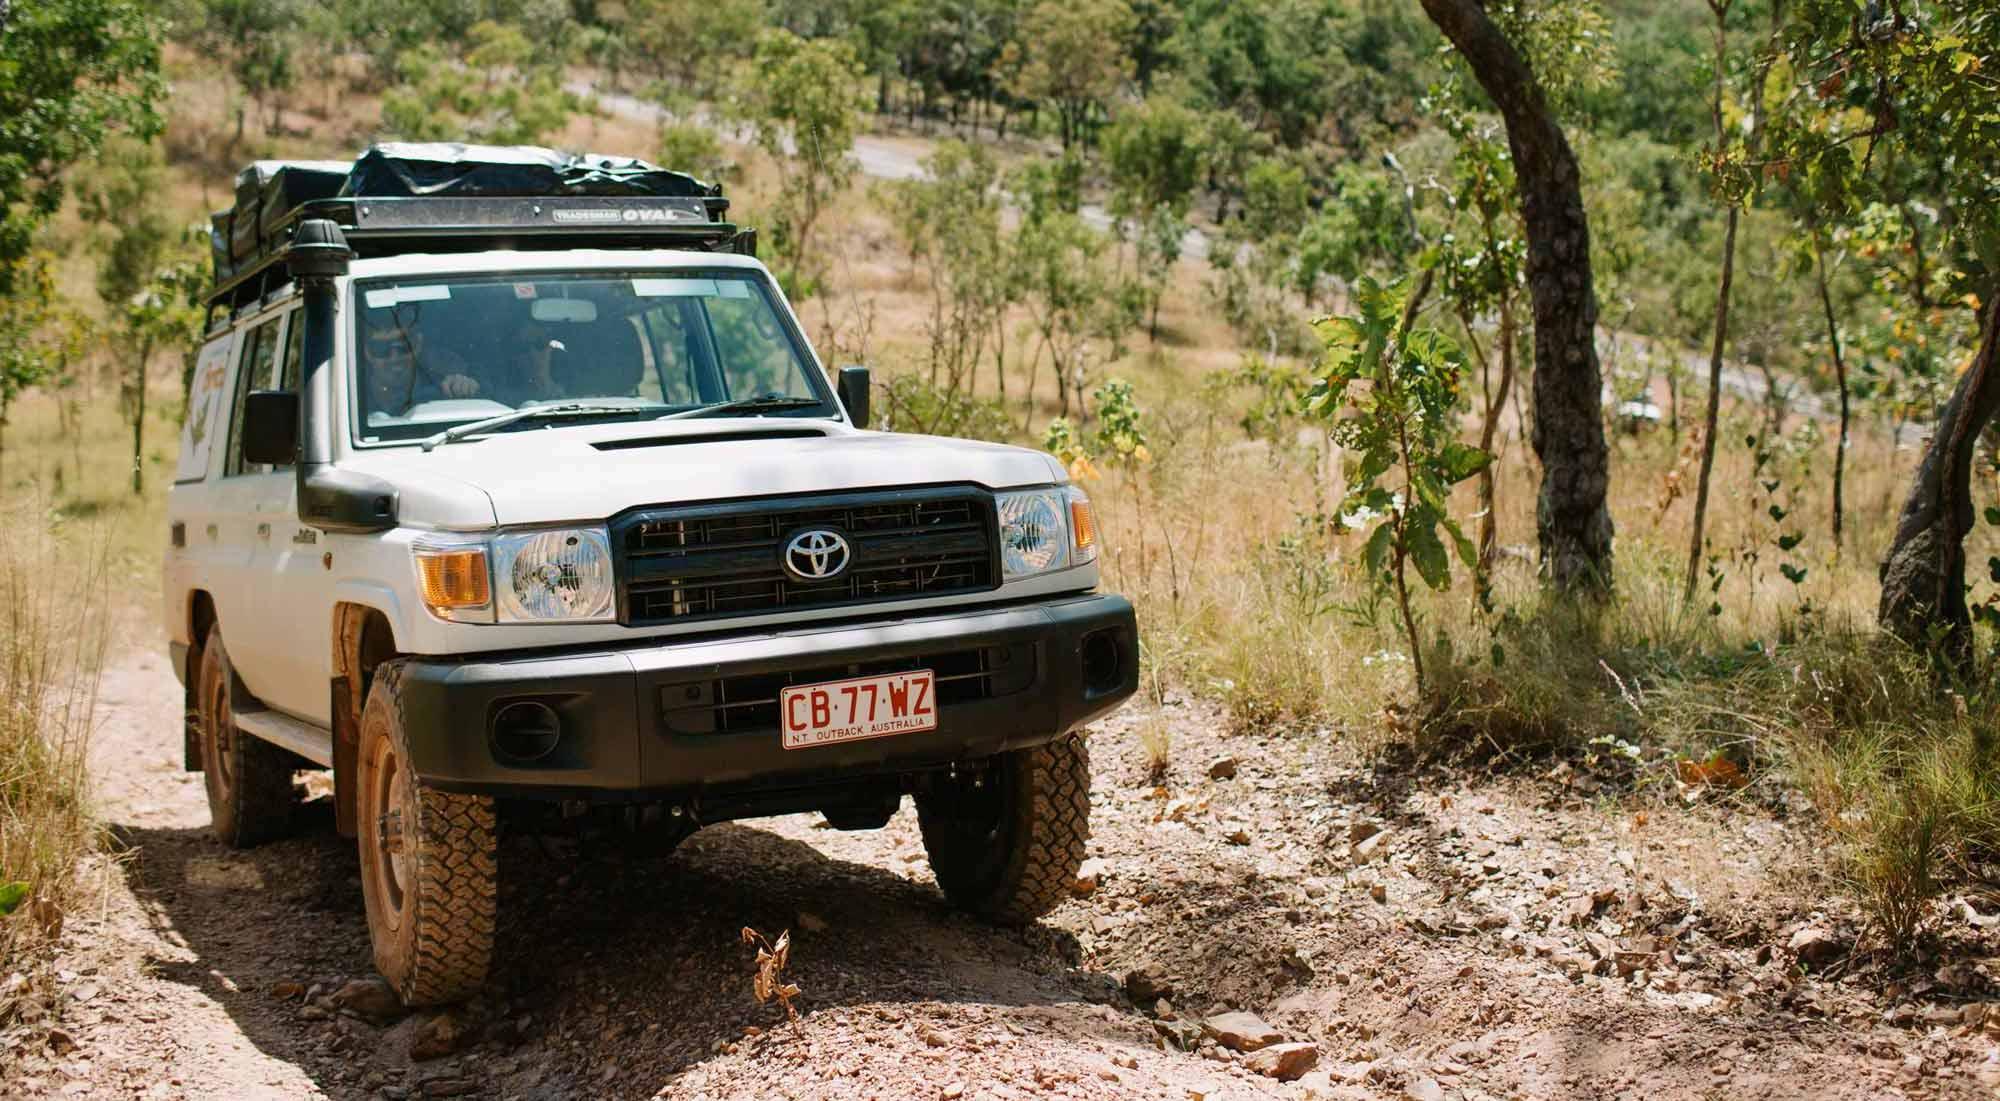 Britz Safari Landcruiser 4WD Off road